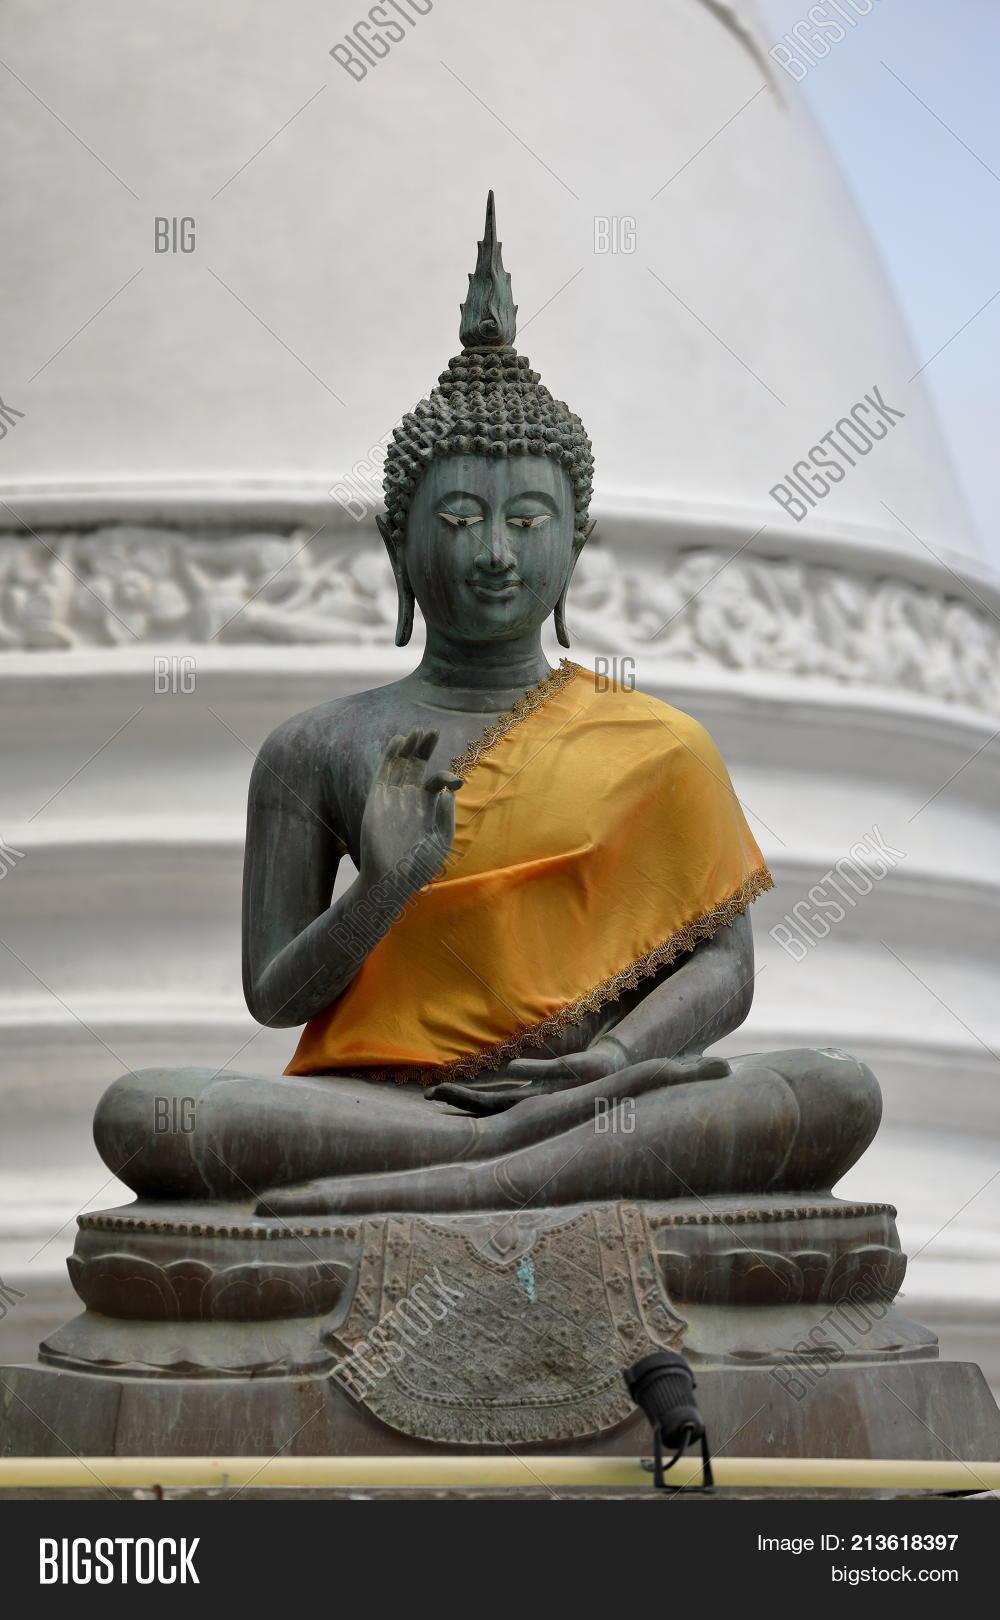 Buddha Figures Seema Image & Photo (Free Trial)   Bigstock